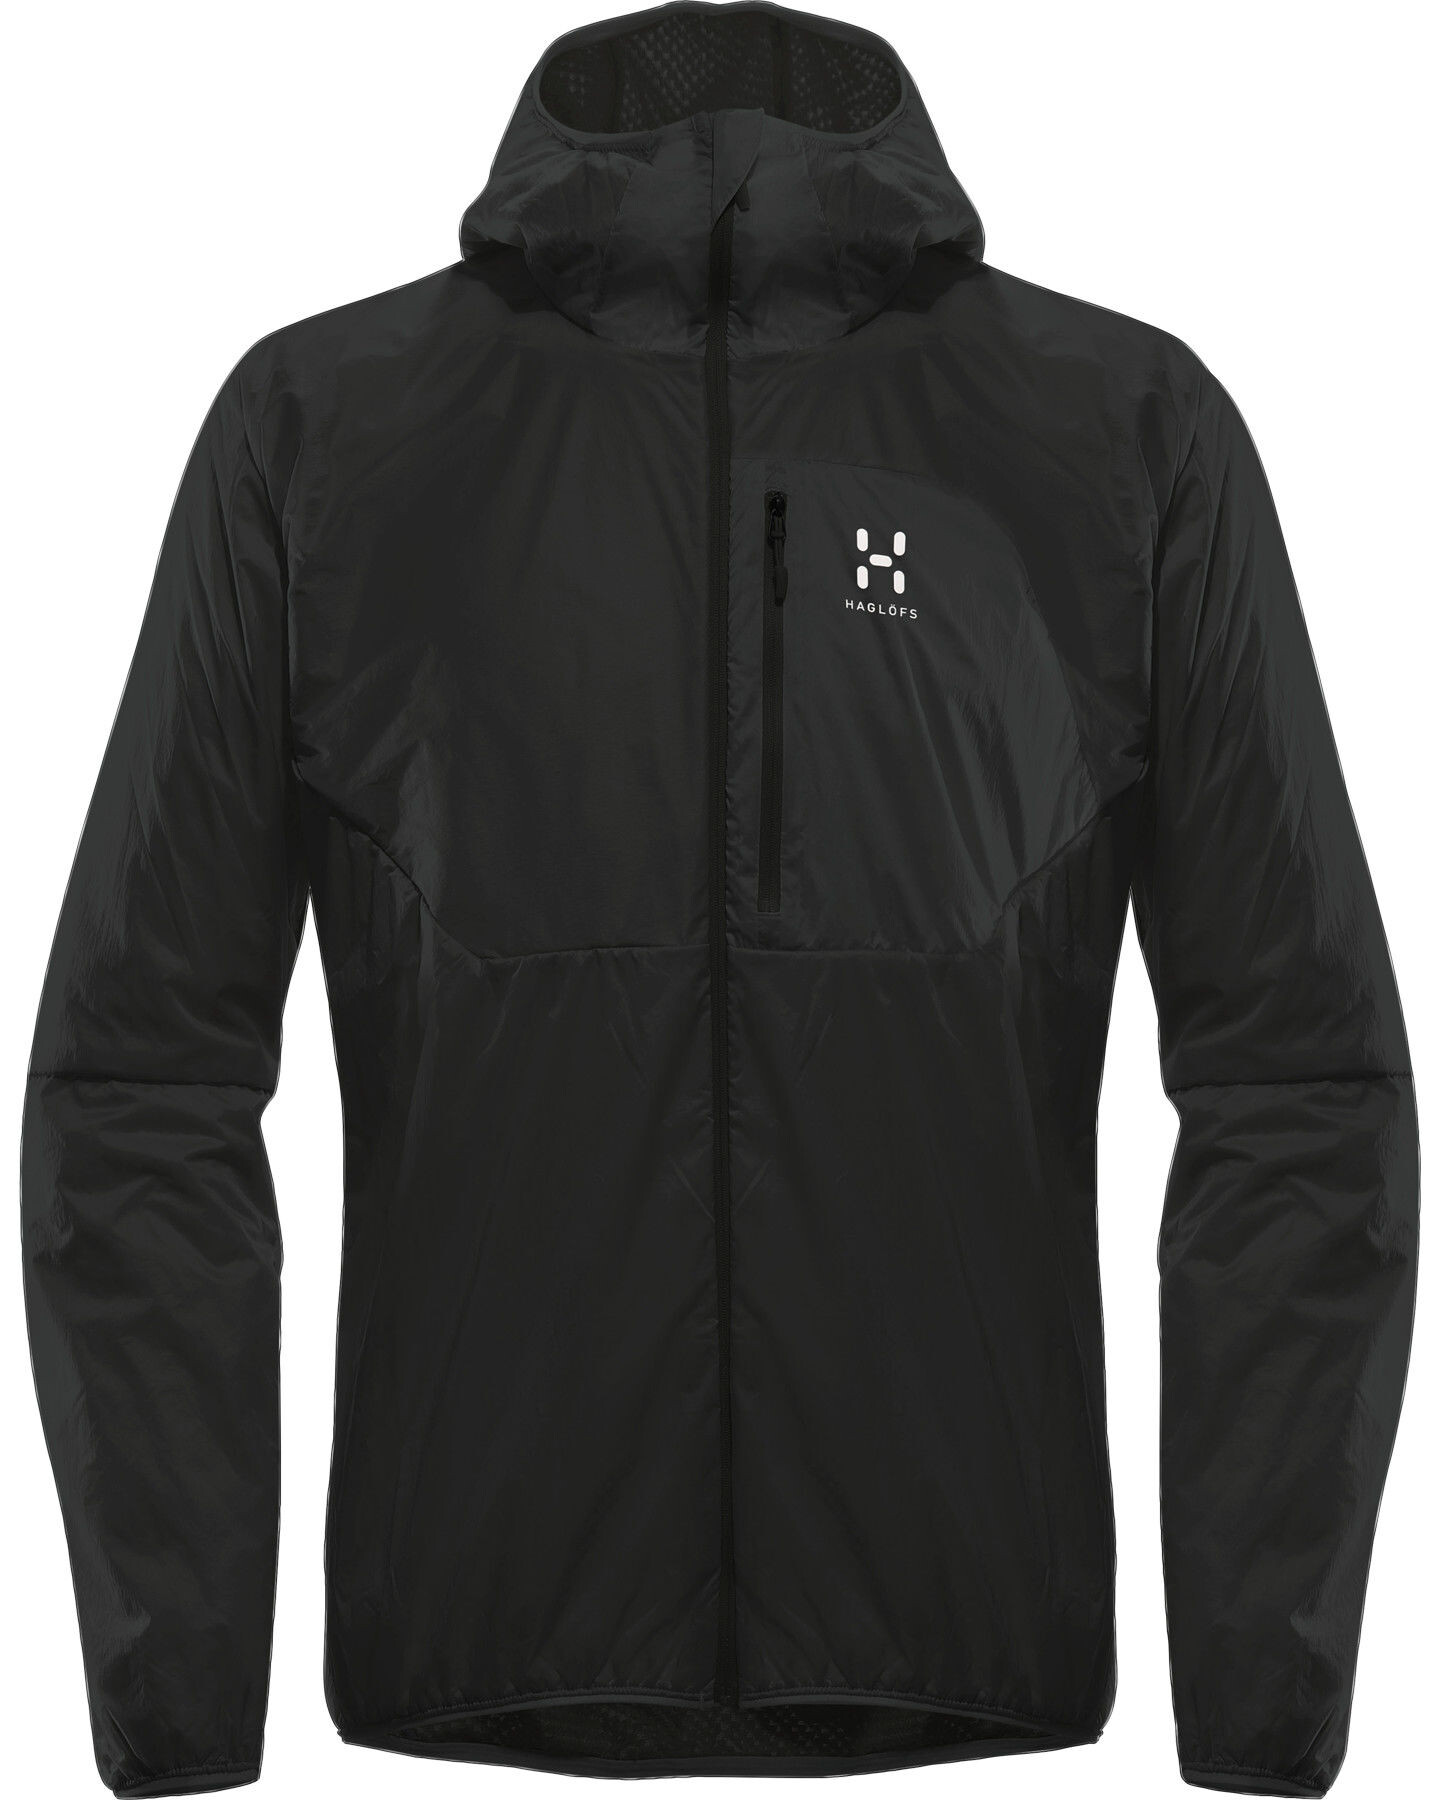 Haglöfs Proteus Jacket Herr true black